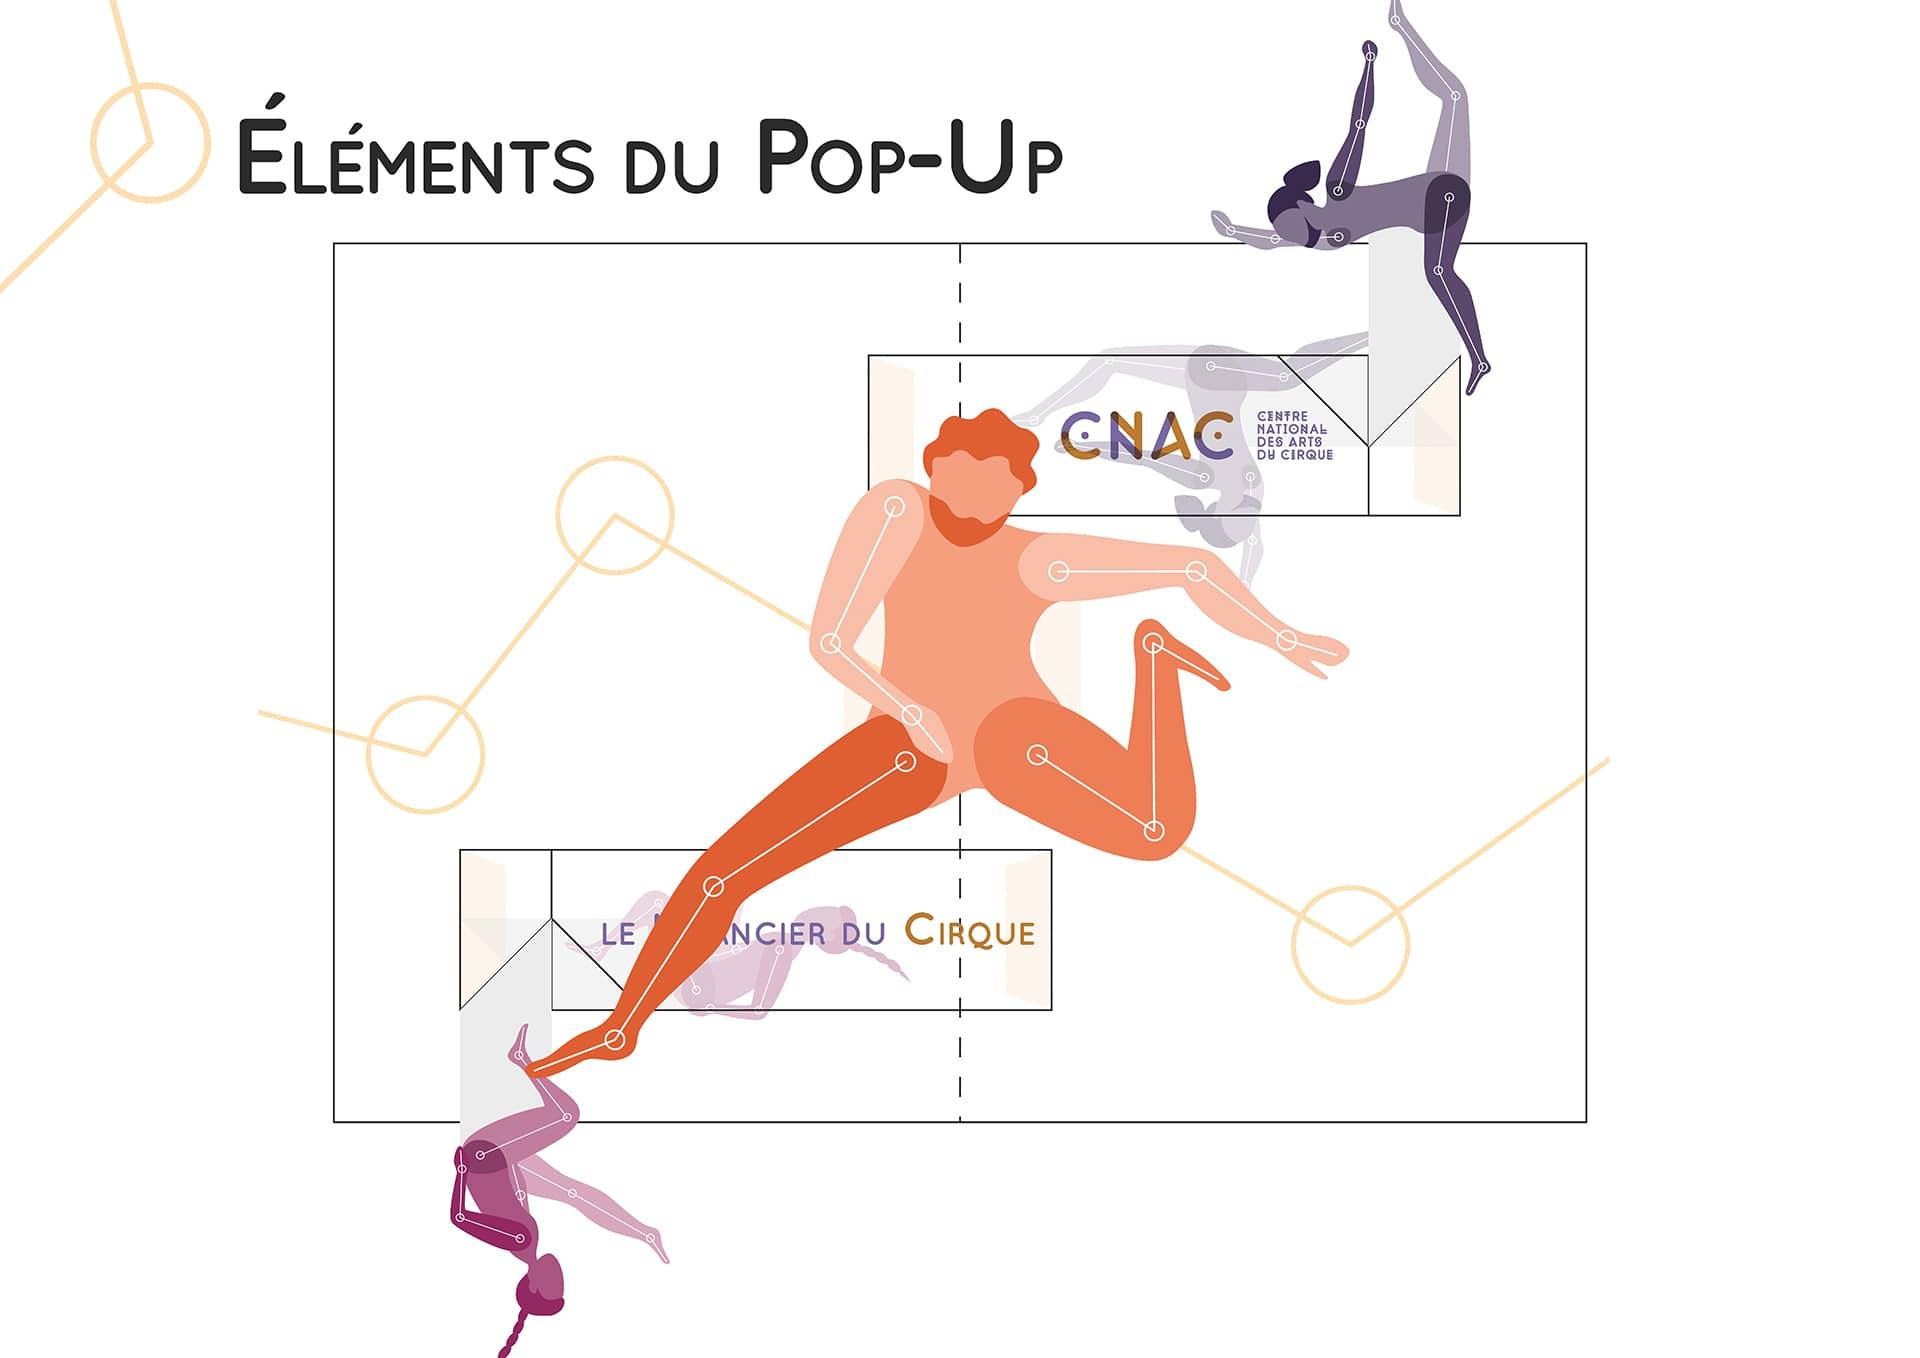 Eléments pop-up